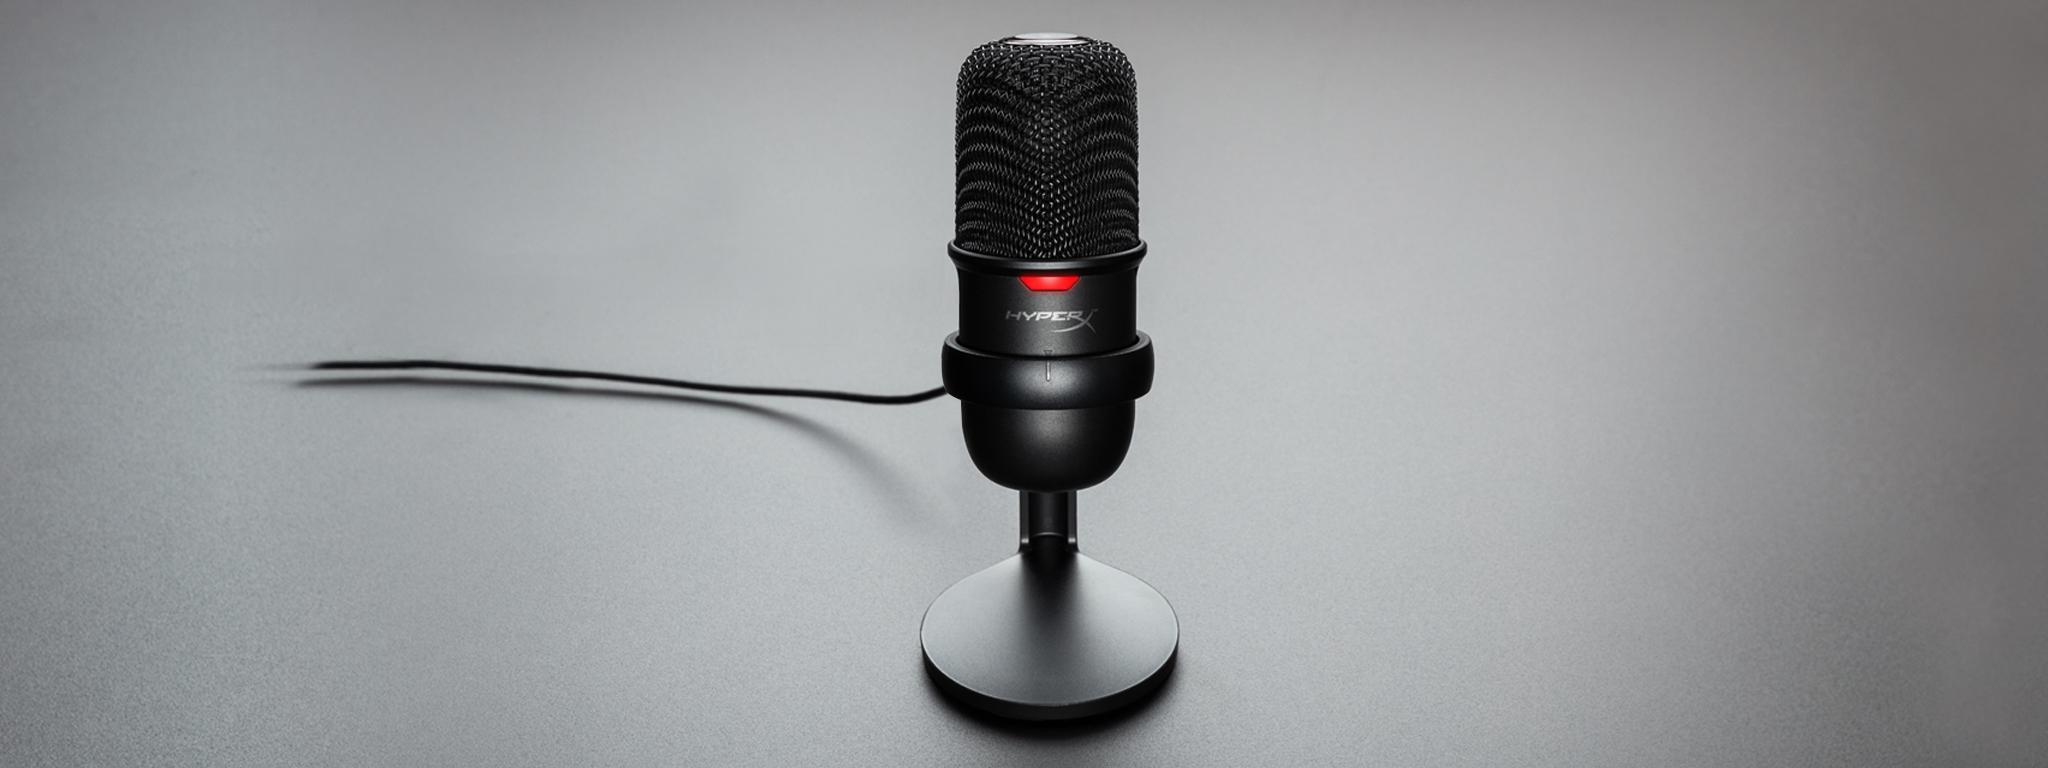 Giới thiệu Microphone Kingston HyperX Solocast - Standalone Microphone HMIS1X-XX-BK/G